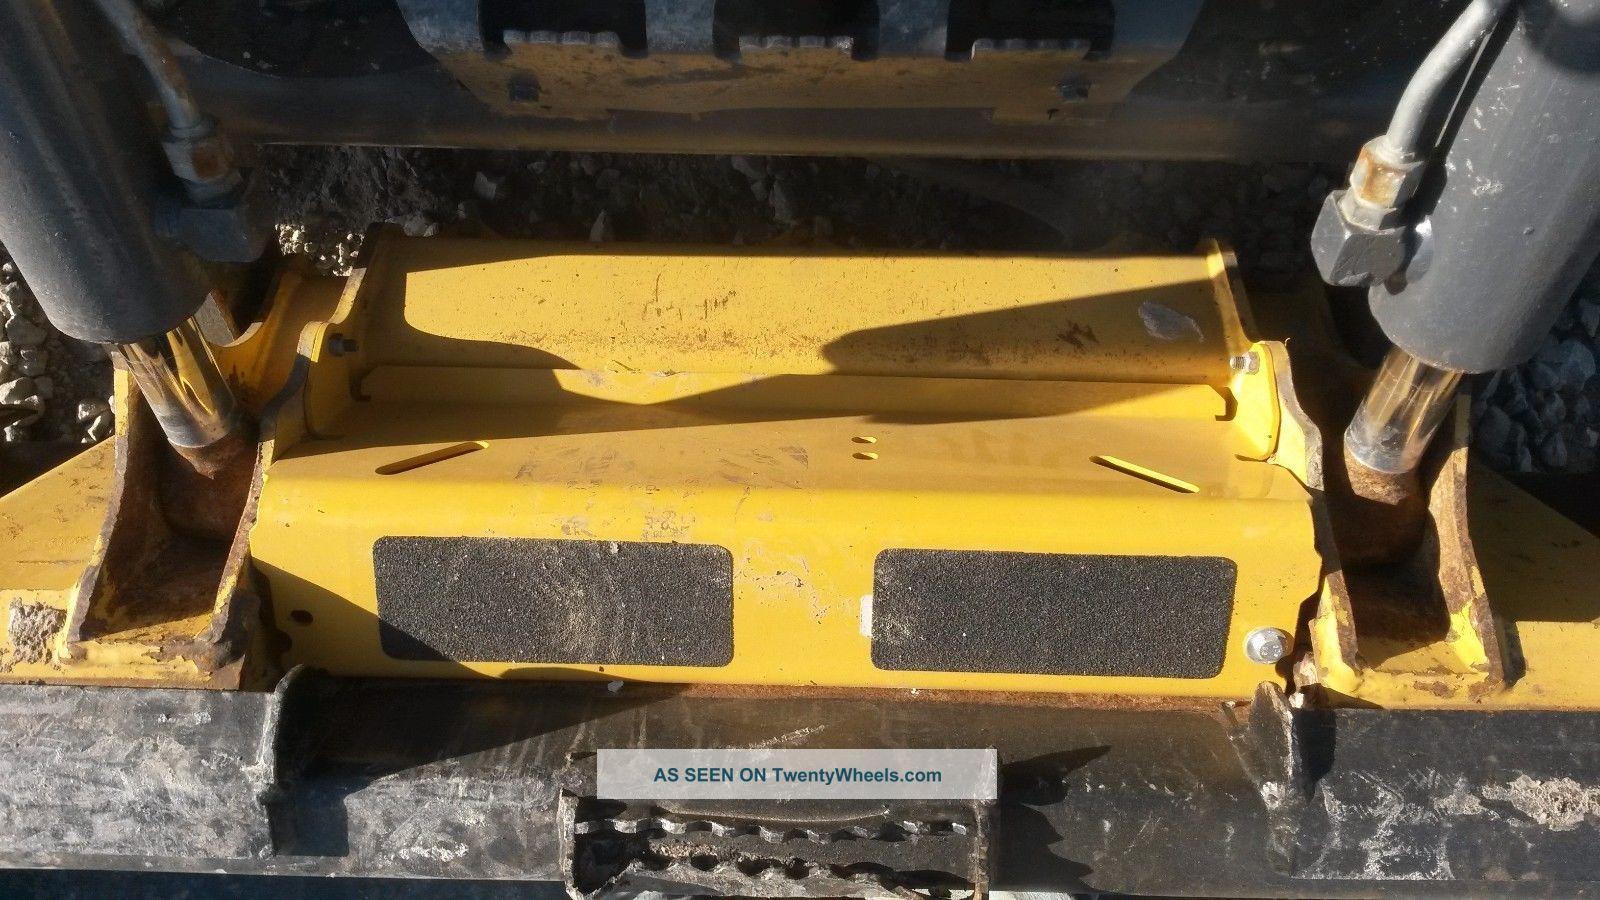 2015 Deere 323e Track Skid Steer,  1230 Hrs,  Cab/heat,  2 Speed,  Availabl Skid Steer Loaders photo